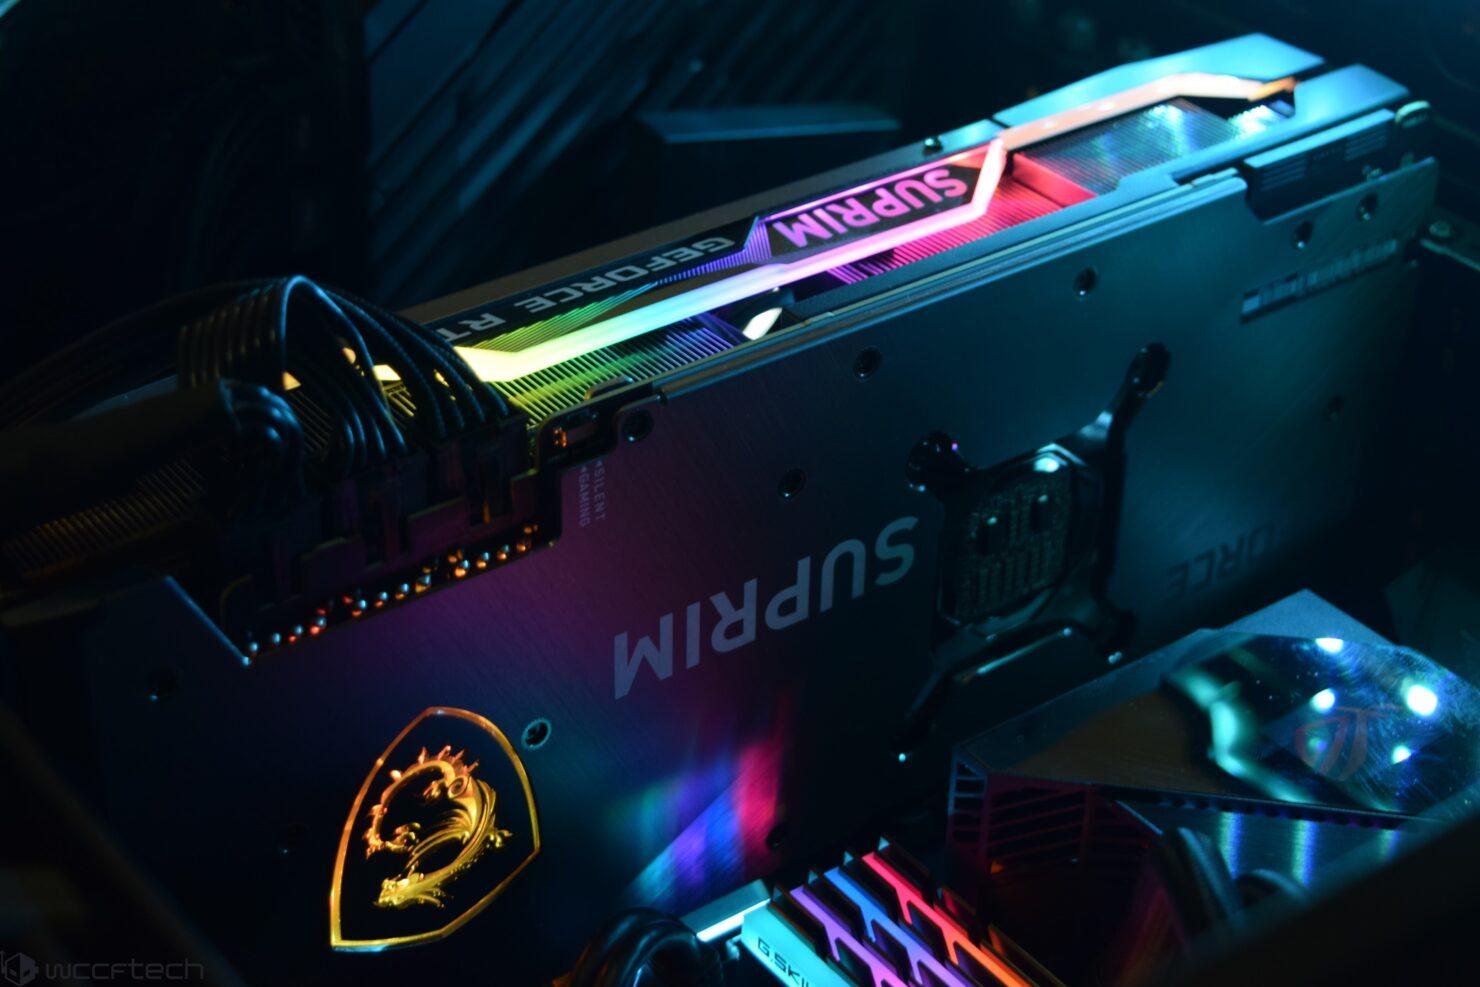 msi-geforce-rtx-3080-ti-suprim-x-custom-nvidia-graphics-card-pictured,-12-gb-gddr6x-memory-&-ampere-ga102-gaming-gpu